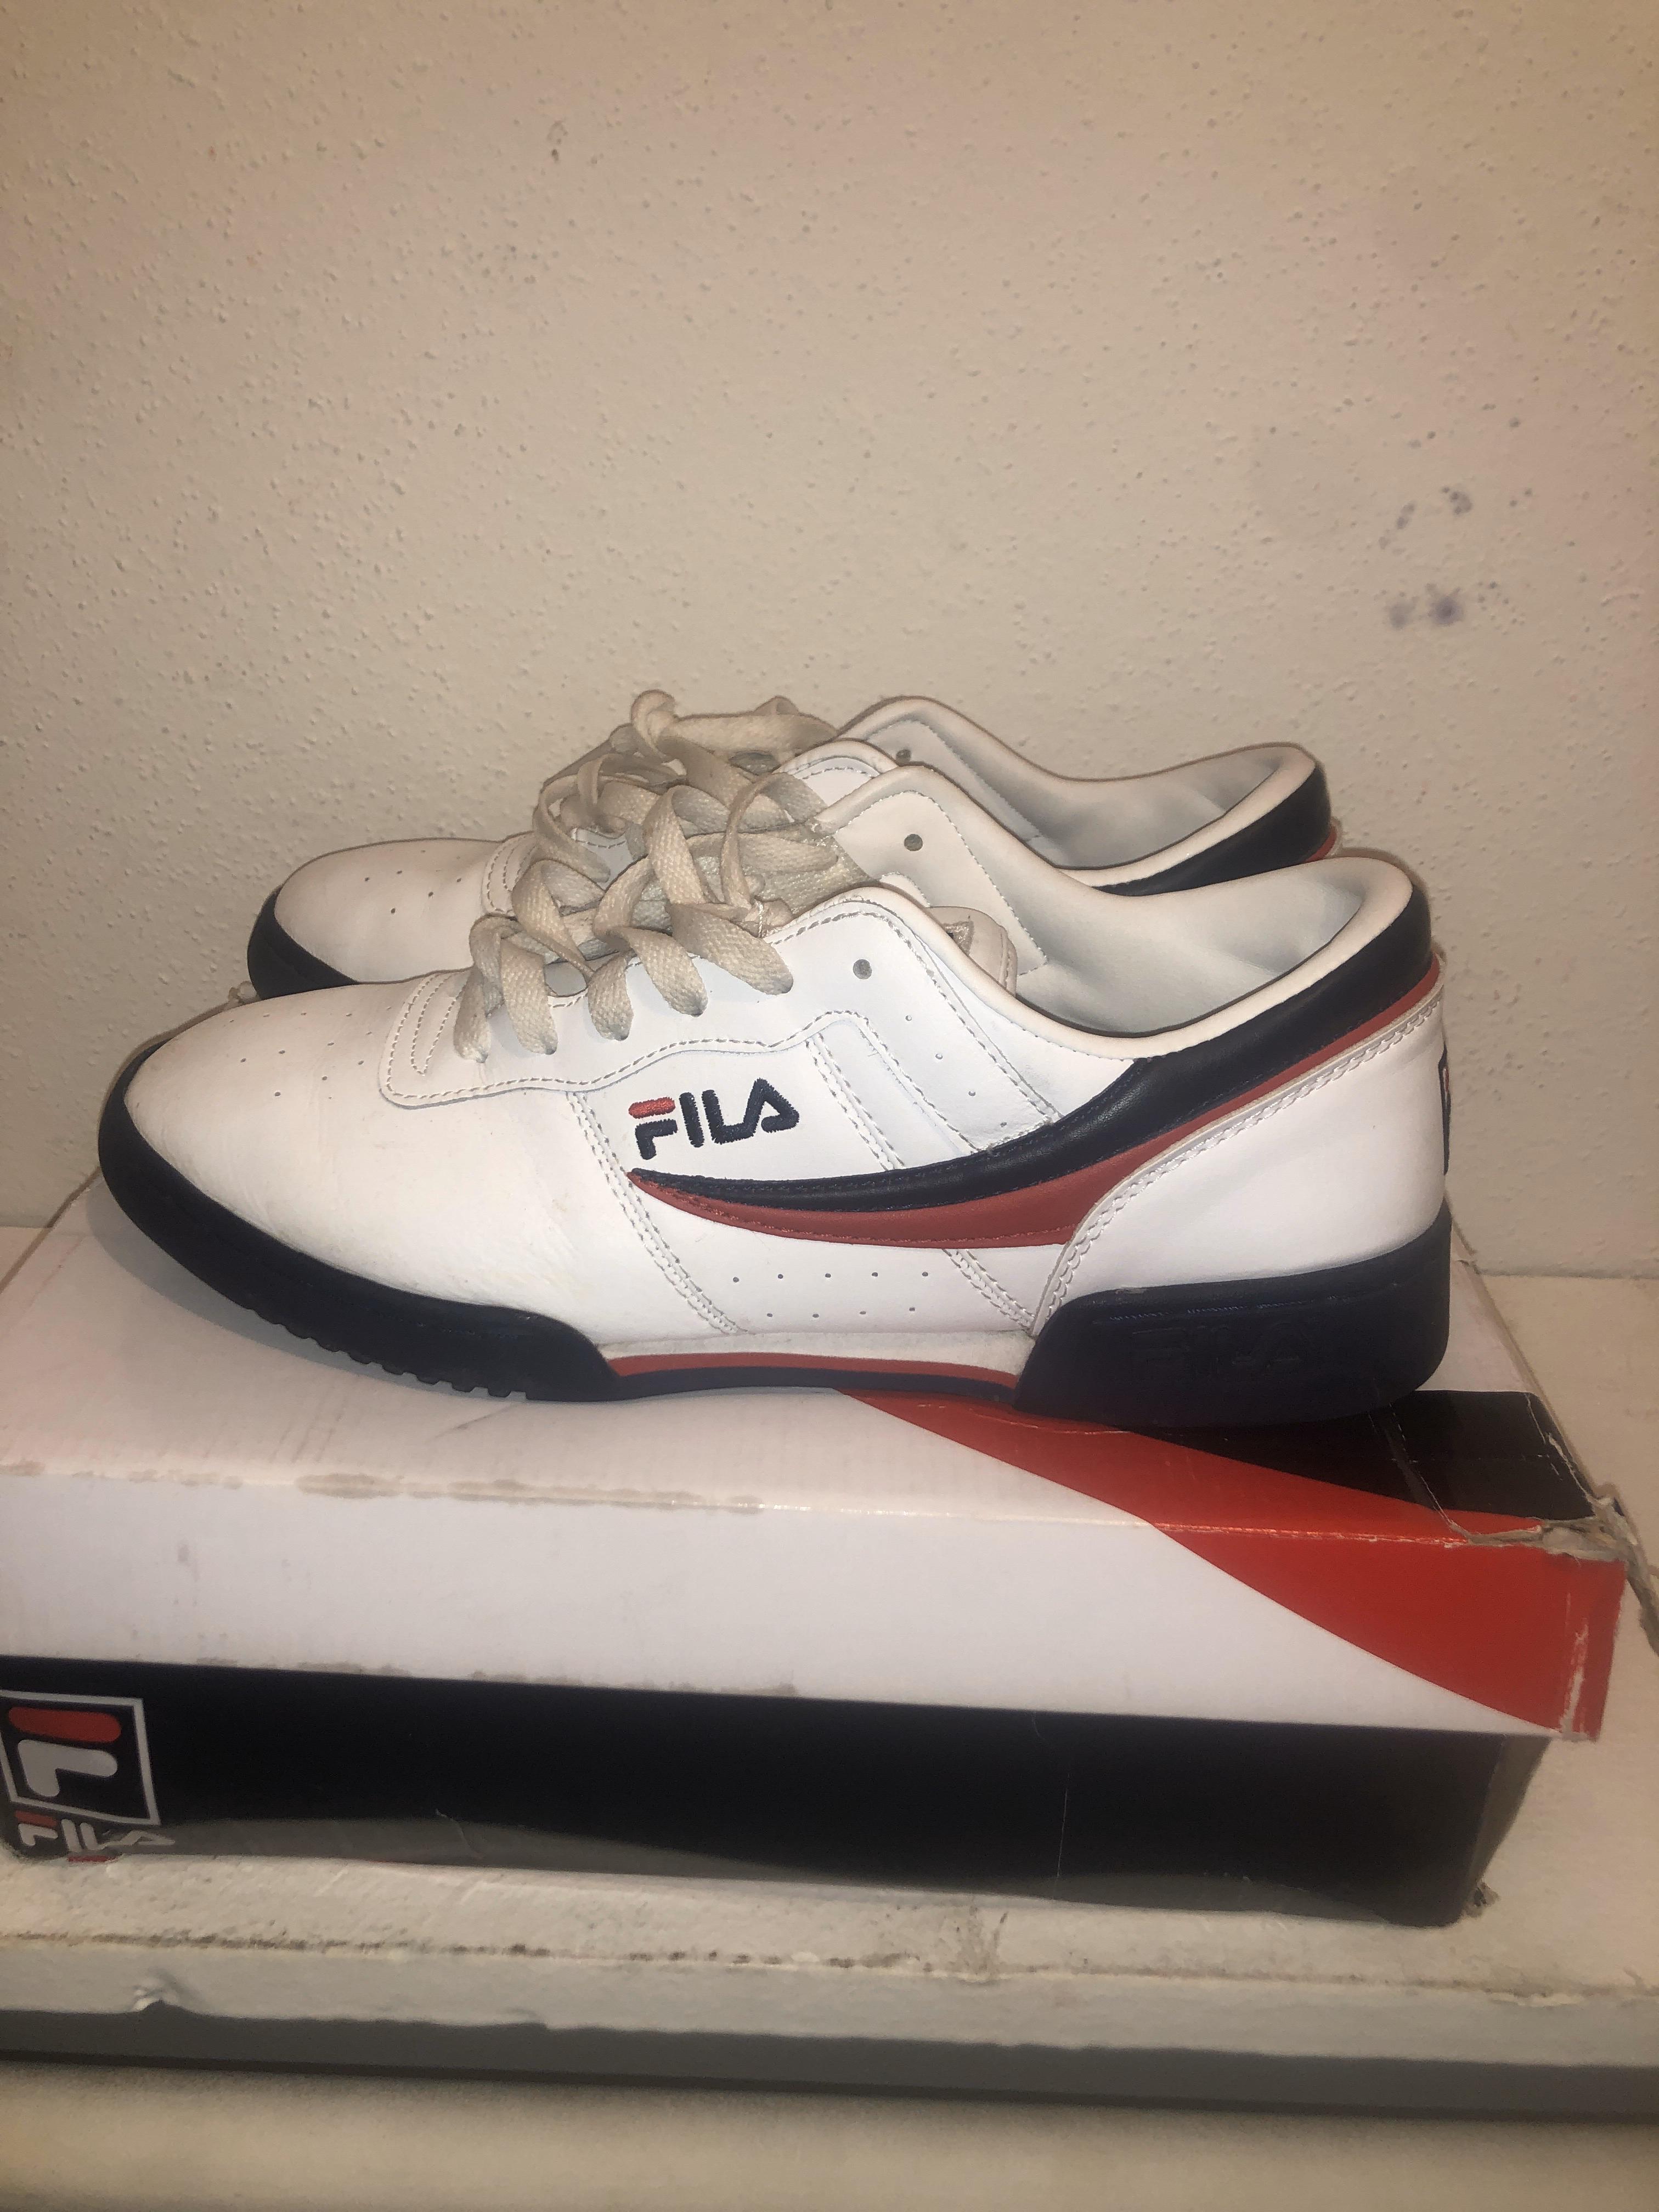 Fila - $70 - Size 10.5